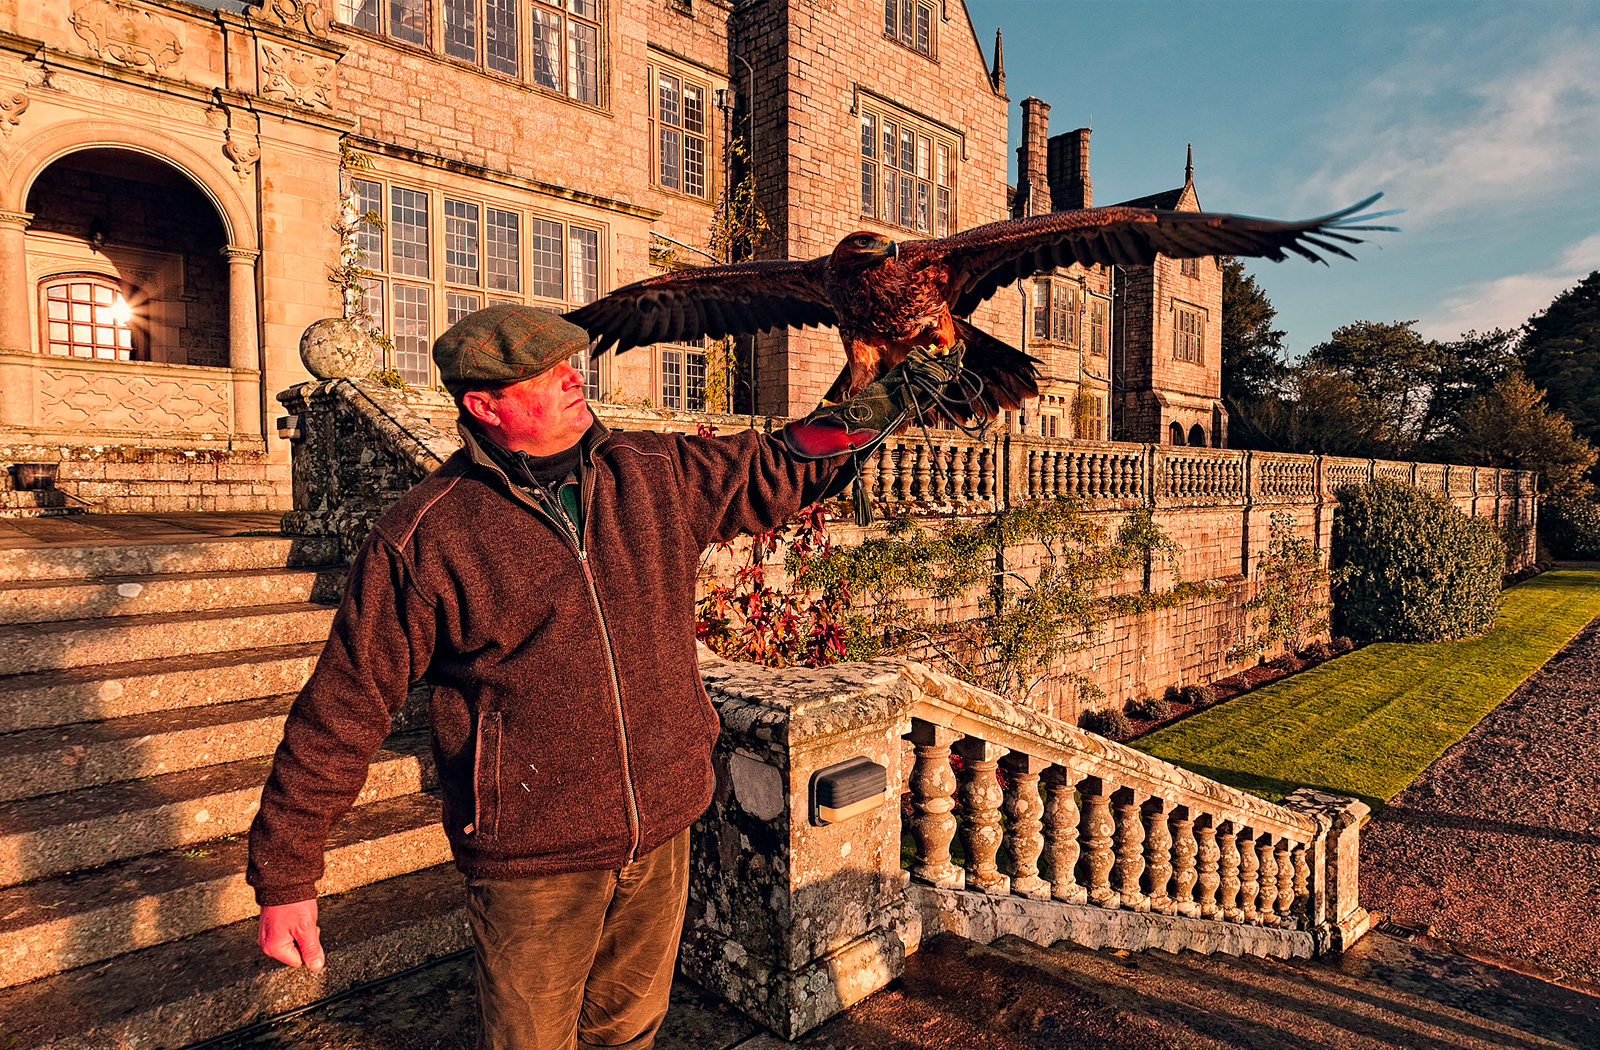 Bovey Castle 360 Photography - Artemis the Eagle